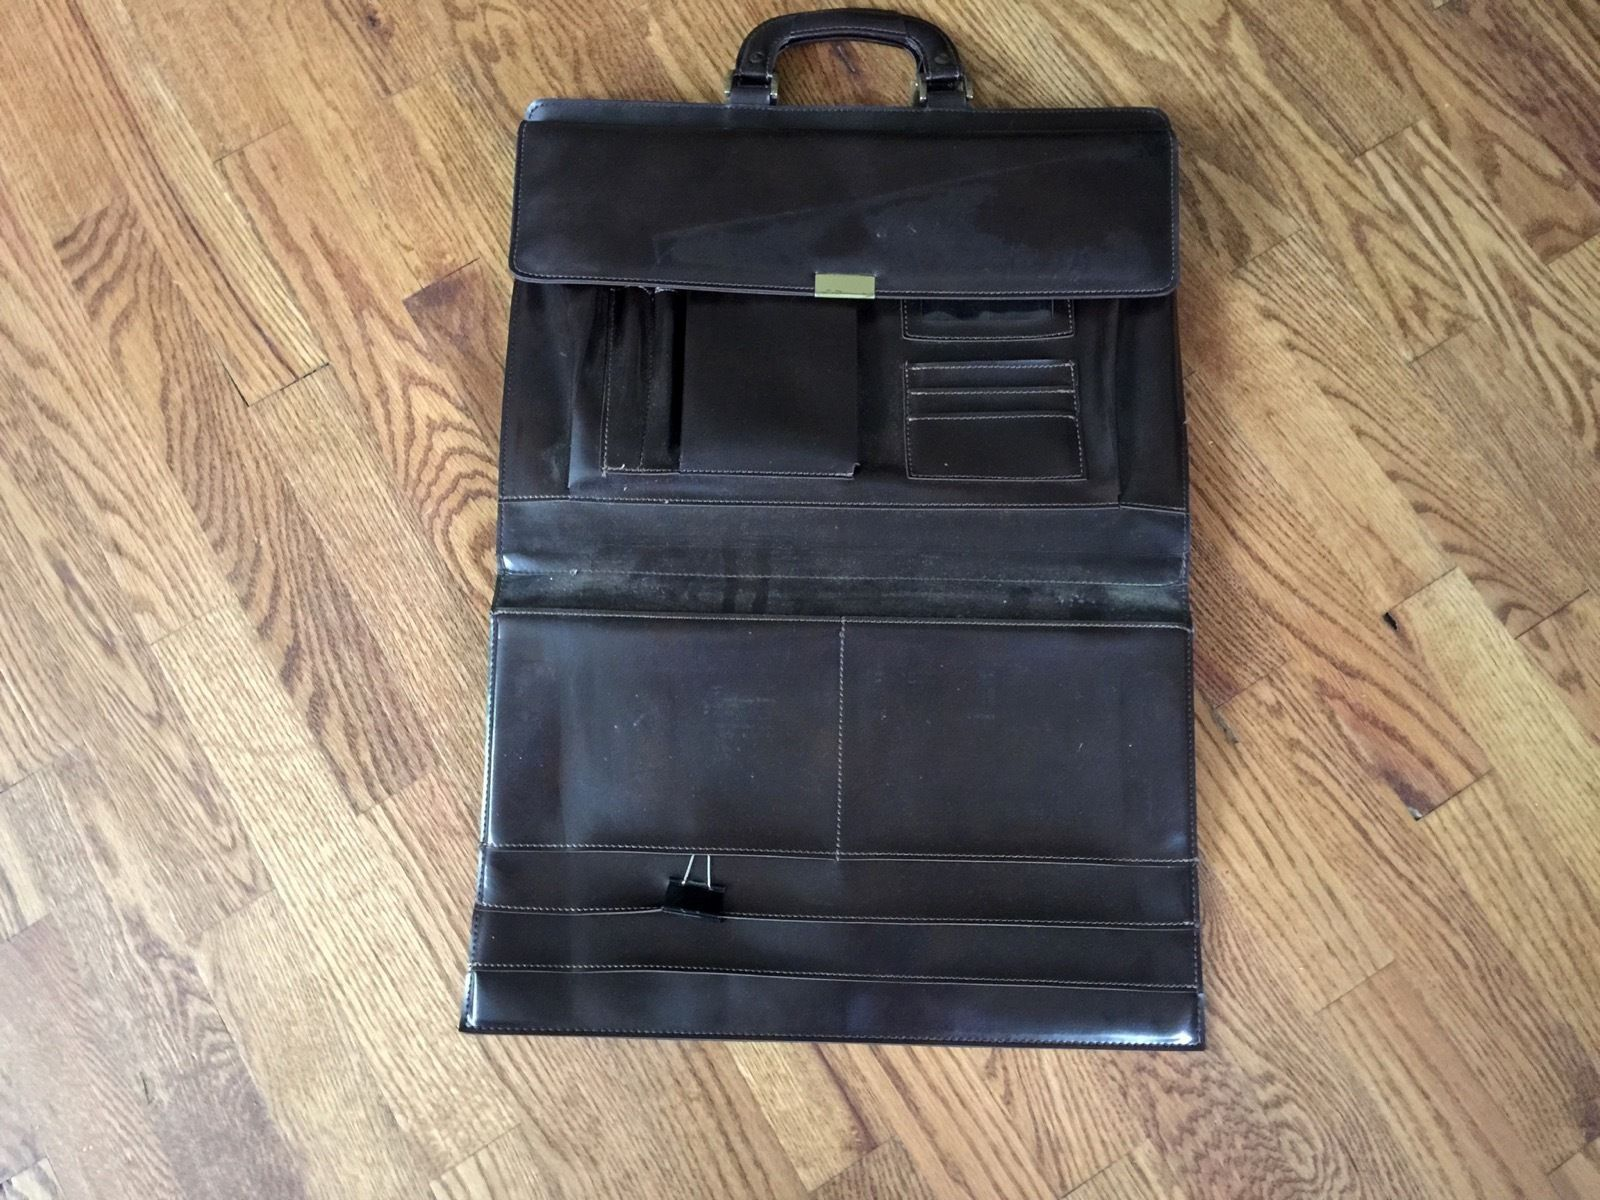 Brown Hazel Attache Portfolio Briefcase Laptop Bag Carrier with Handles